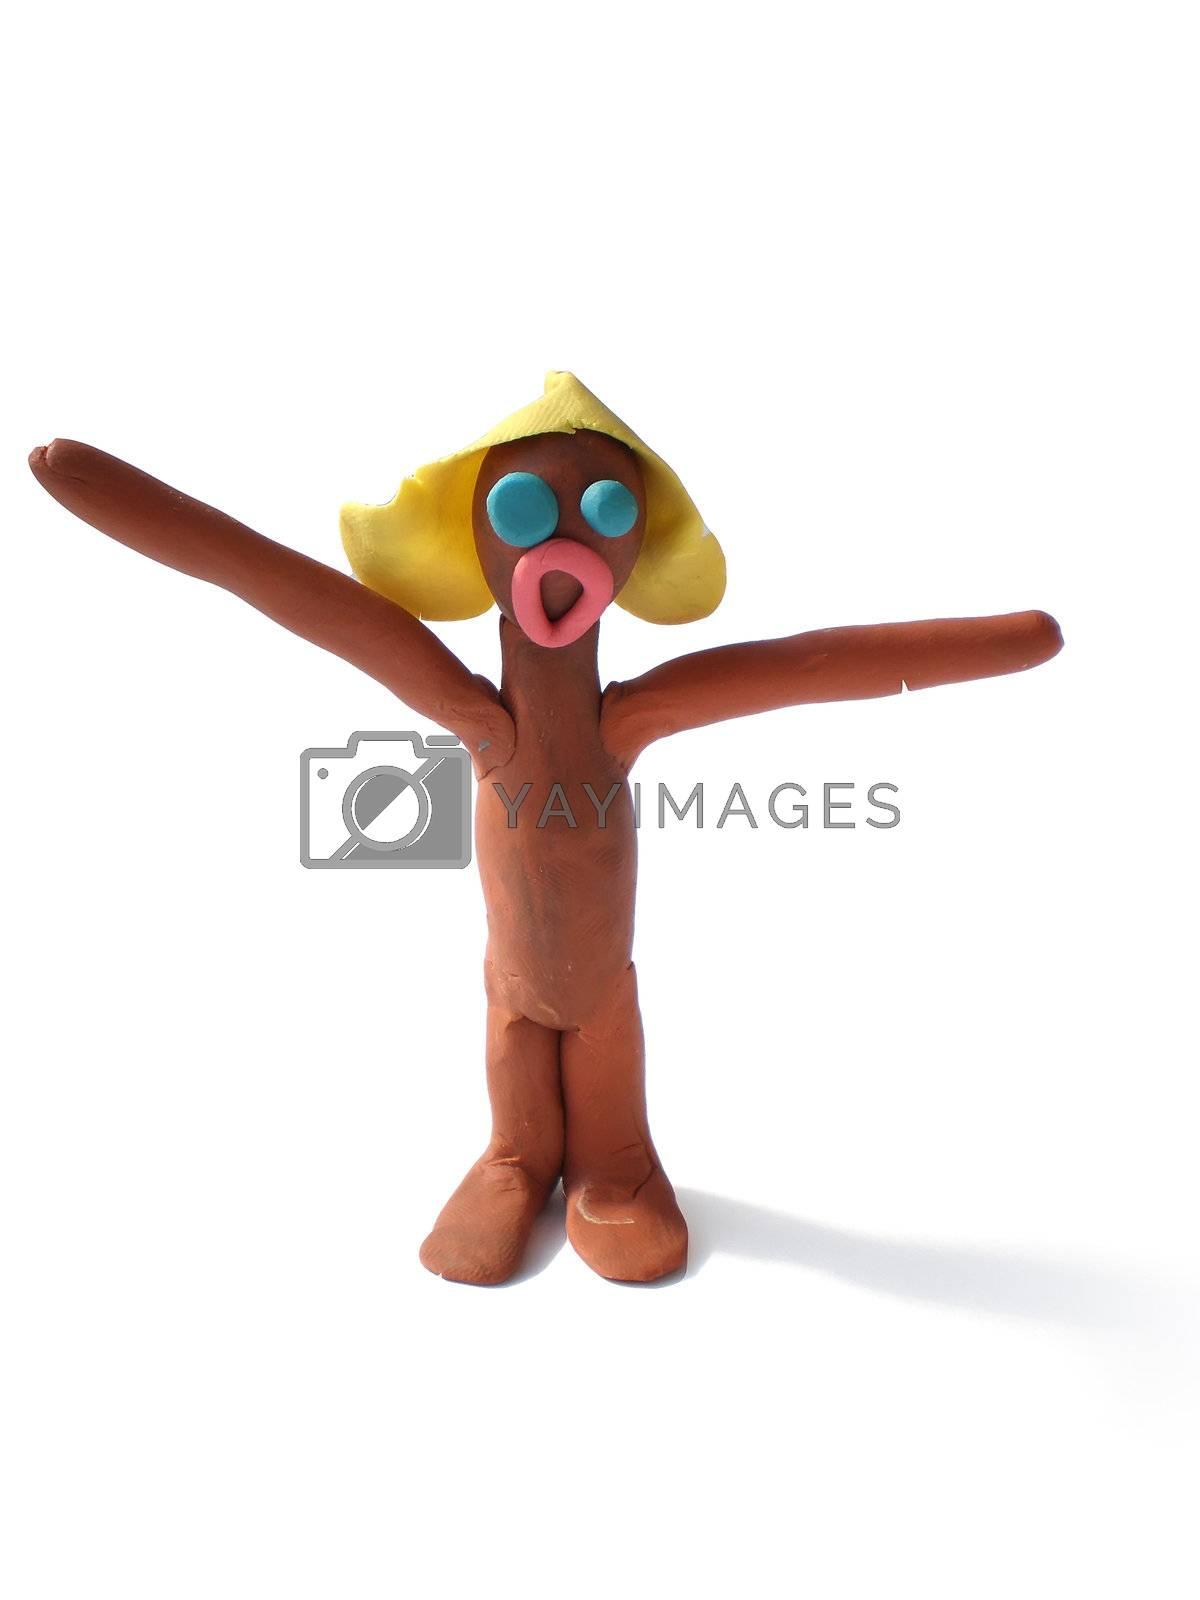 Royalty free image of plasticine people figures saying hi by Dessie_bg